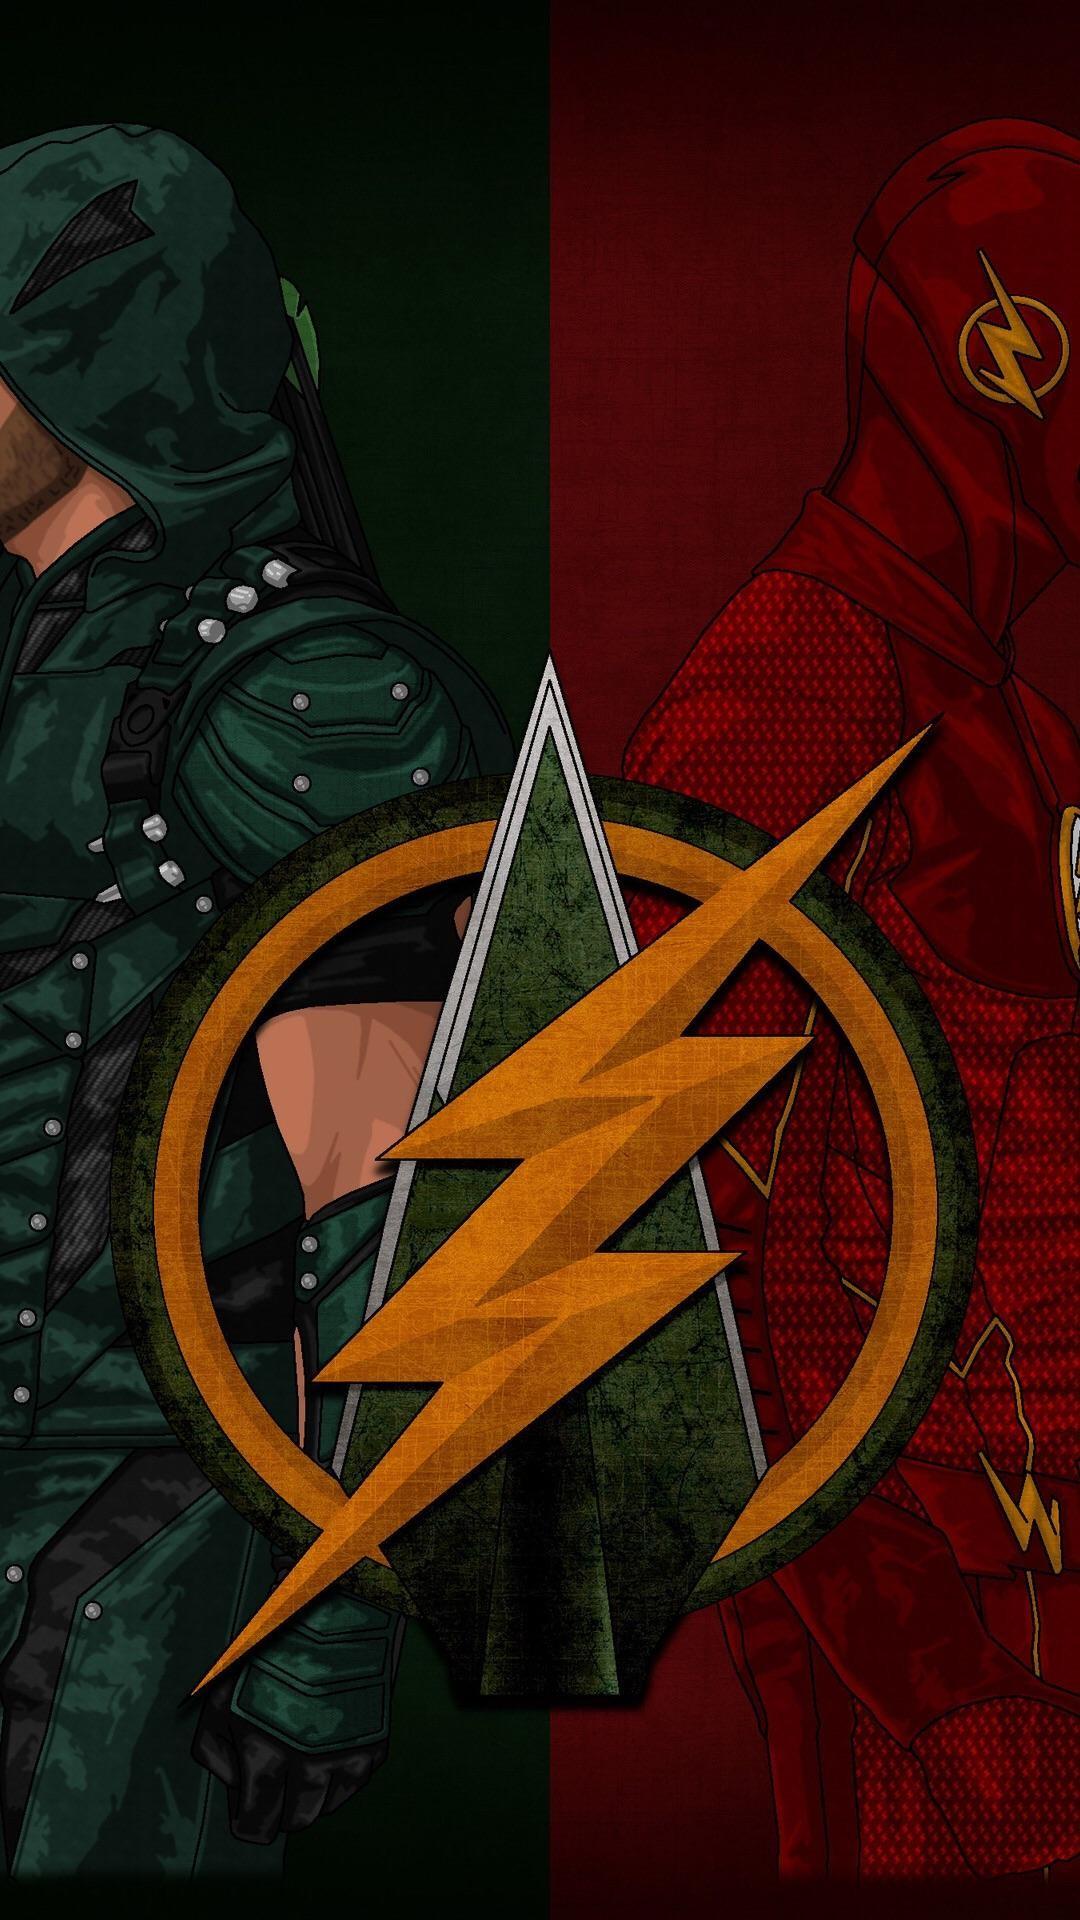 Arrow iPhone Wallpaper 76 images